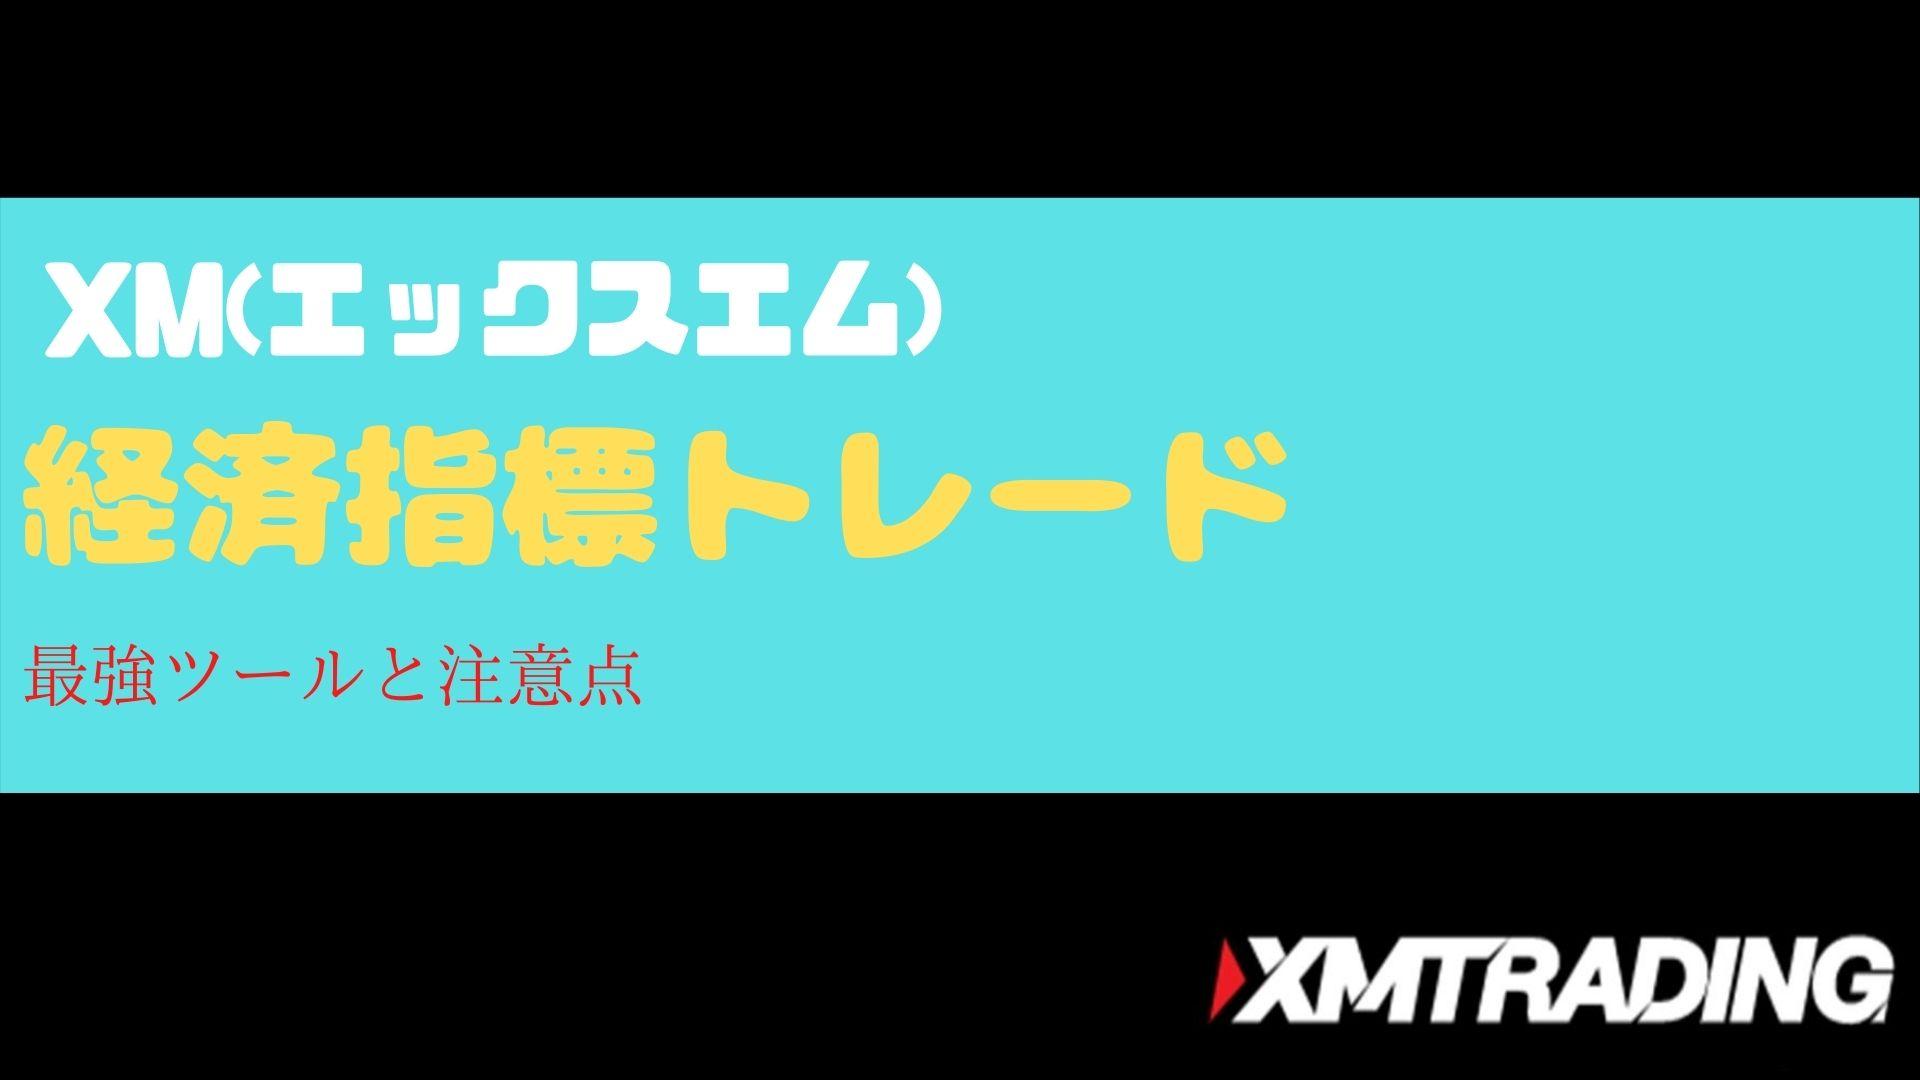 xm-economic-indicator-title